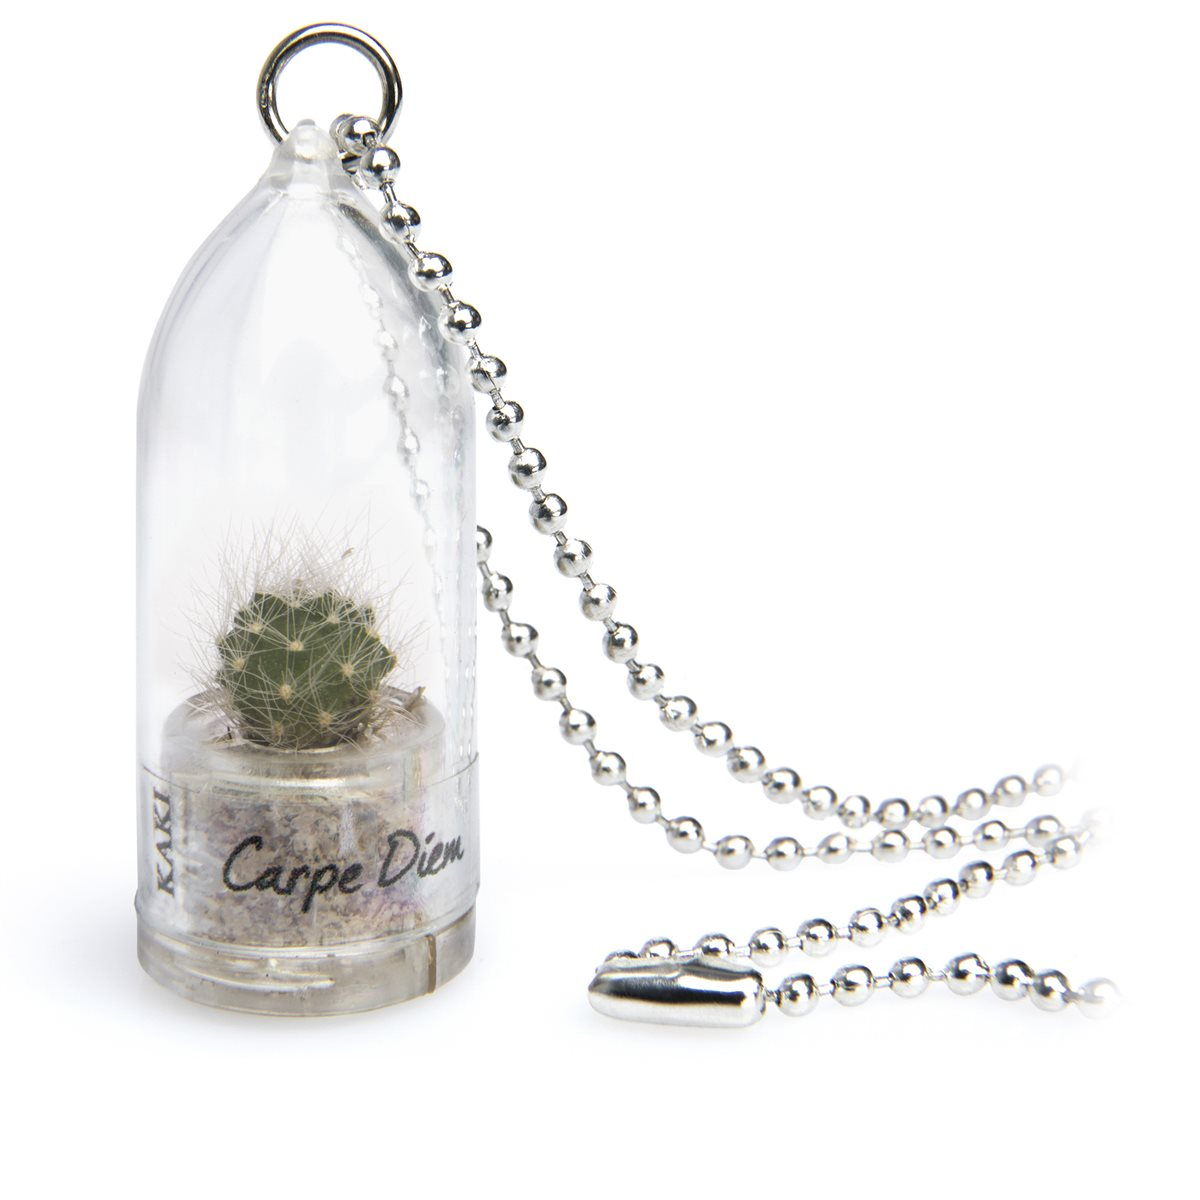 Capsule Green Jewel